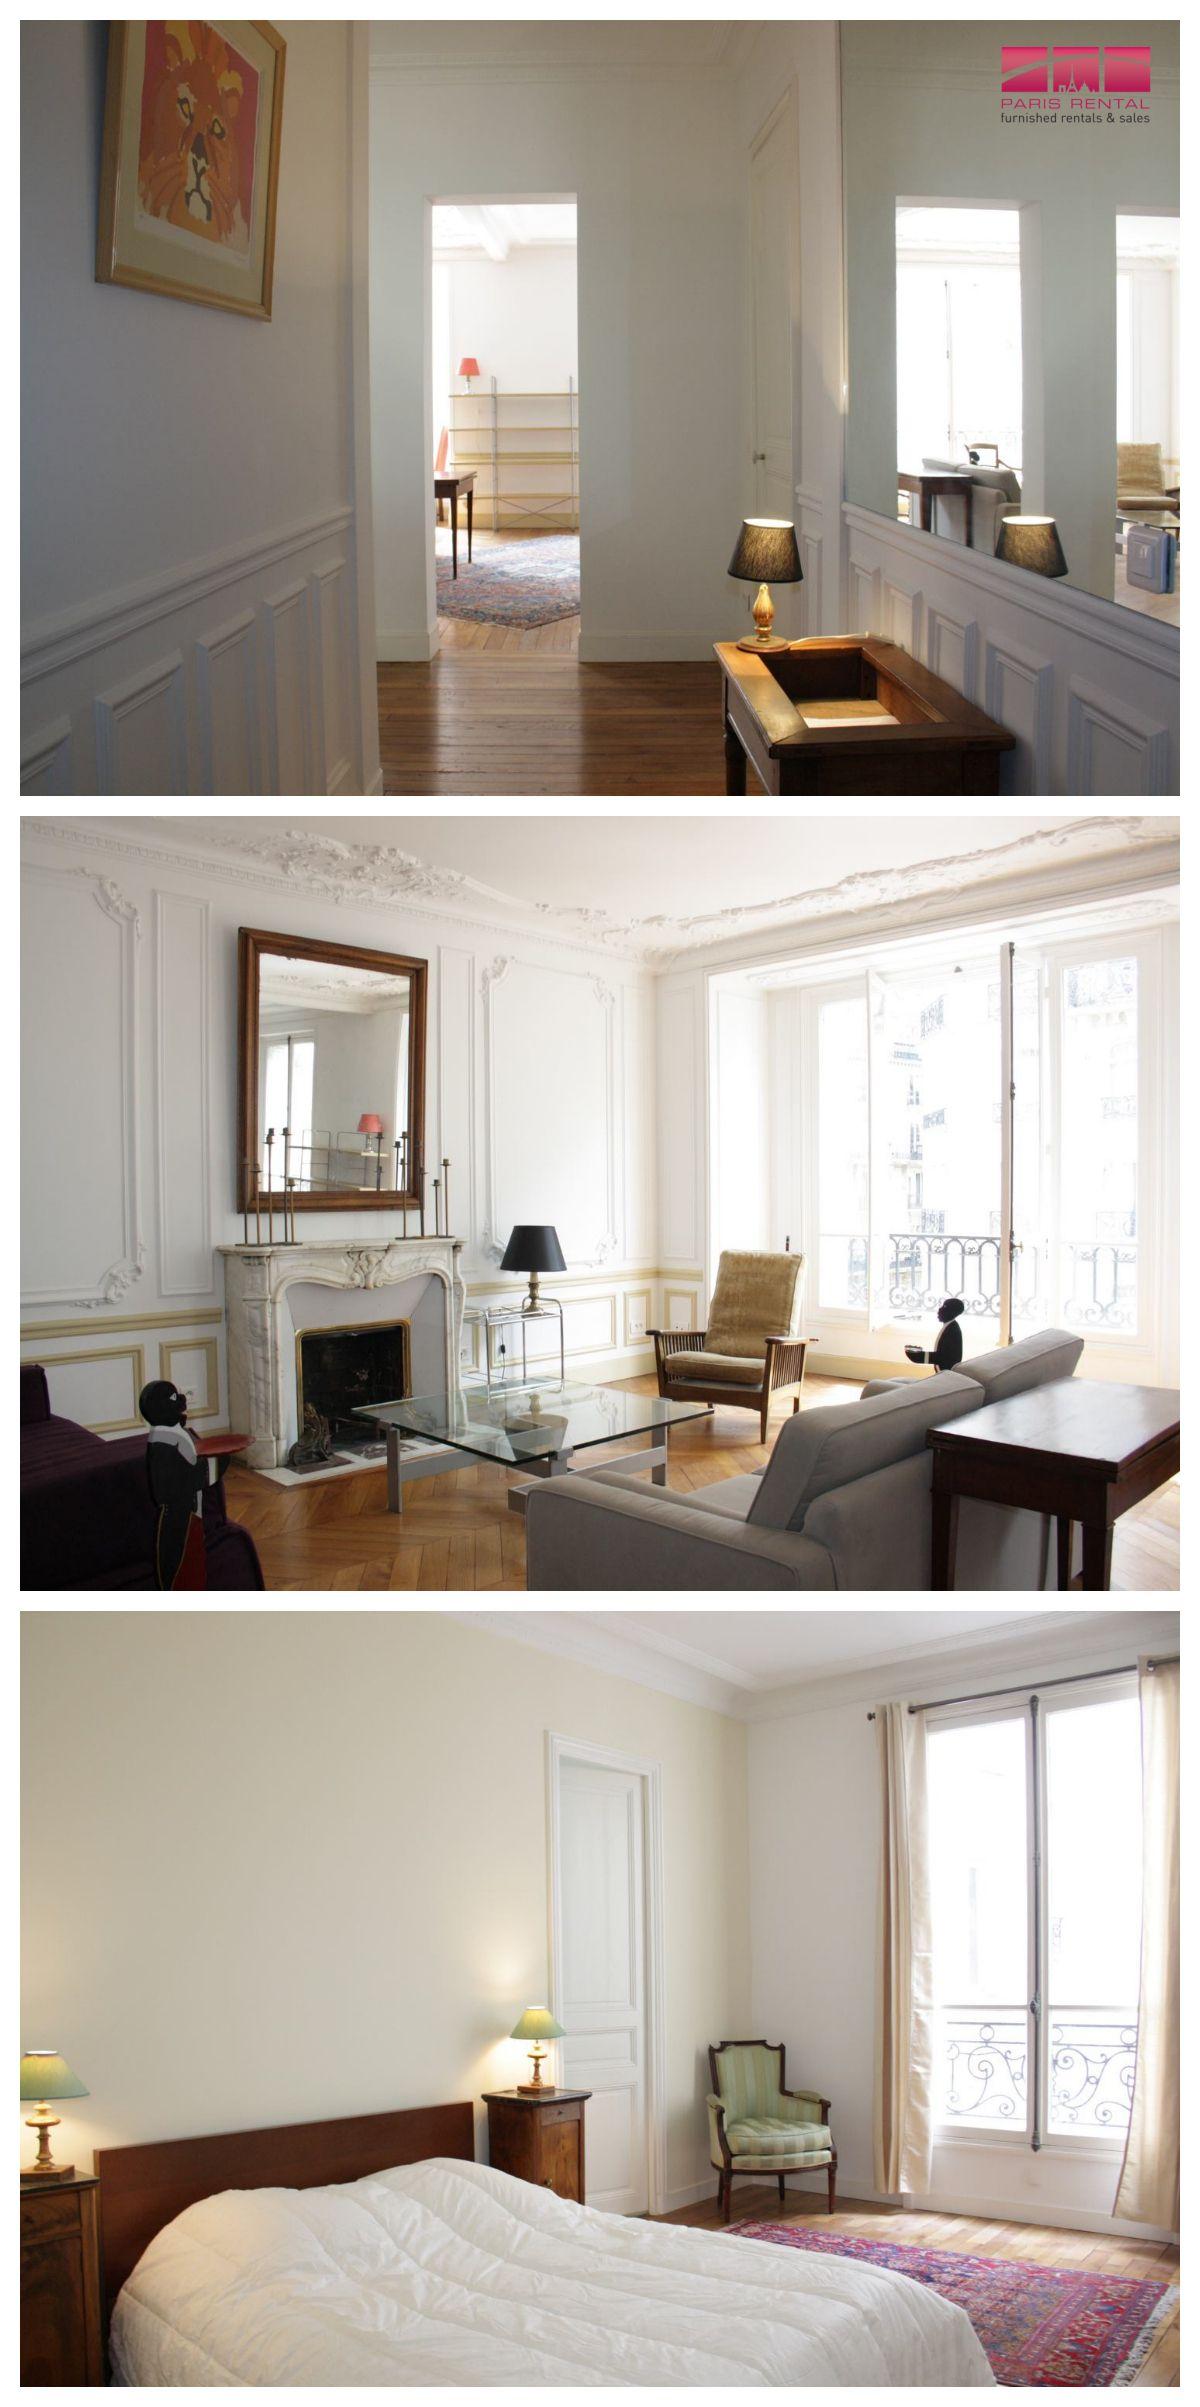 2 bedroom interior design modern furnished bedroom in the th arrondissement lots of sun